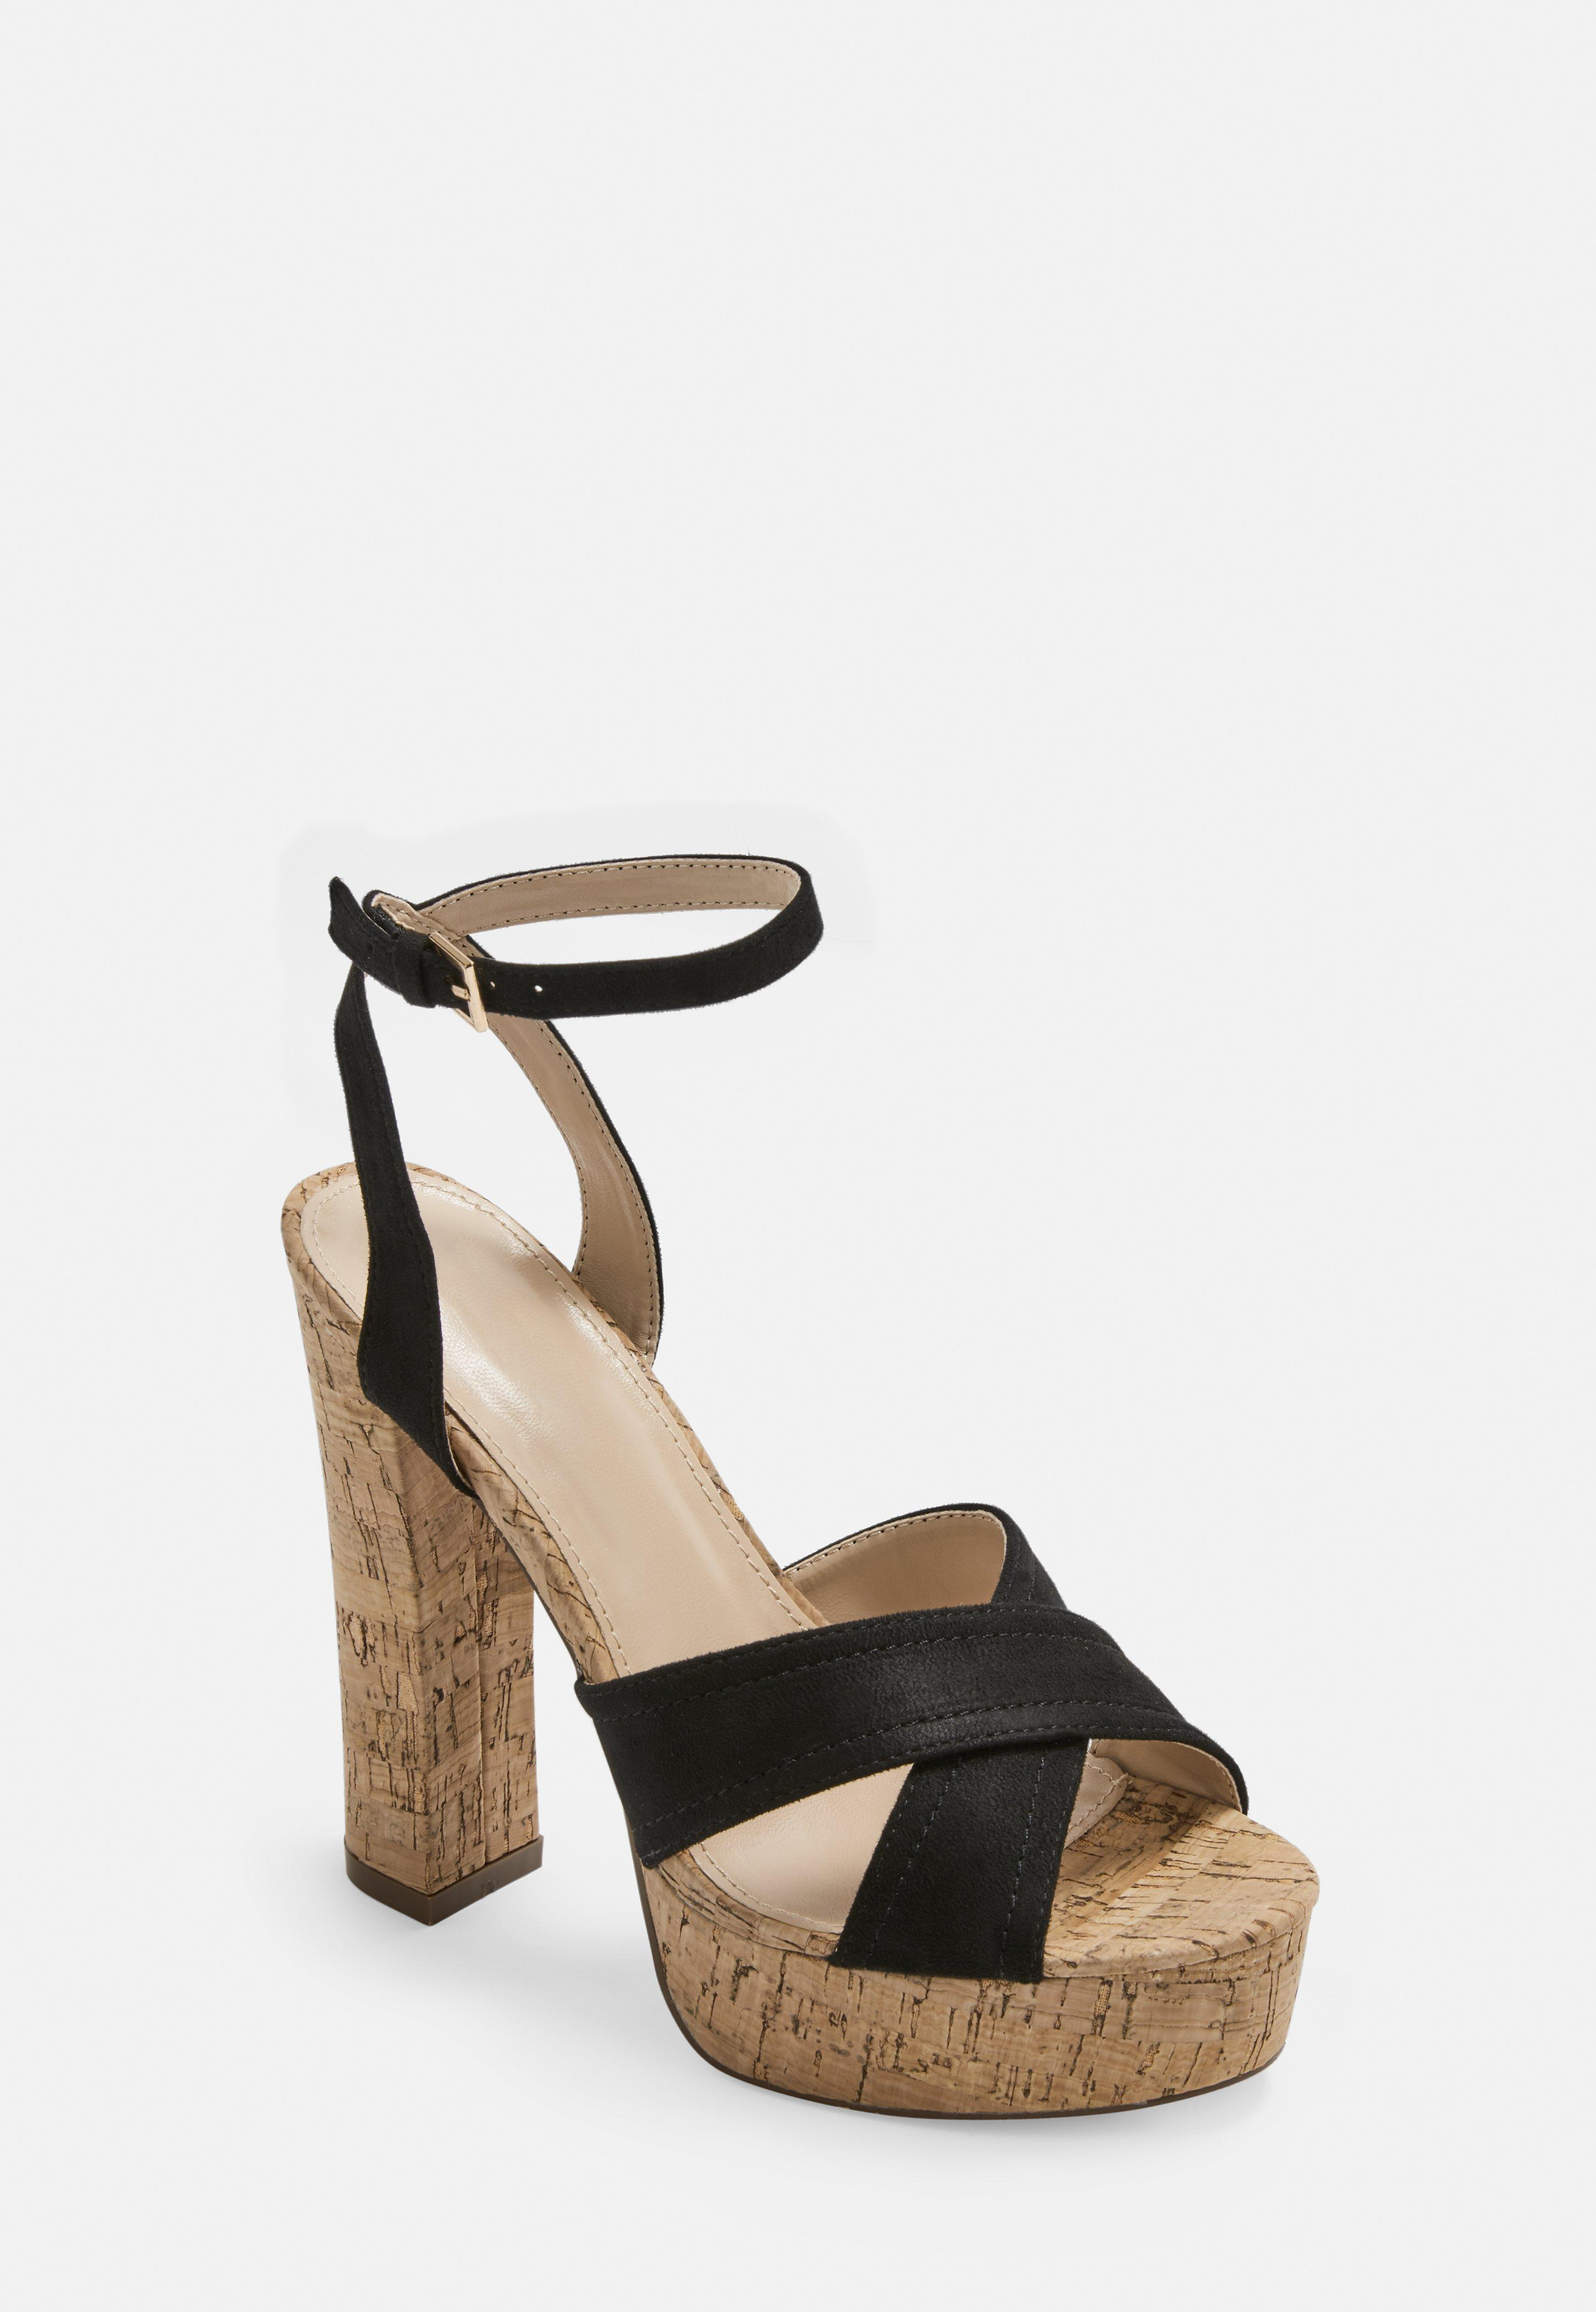 39756497f2 Heeled Sandals | Womens Stiletto Sandals Online - Missguided